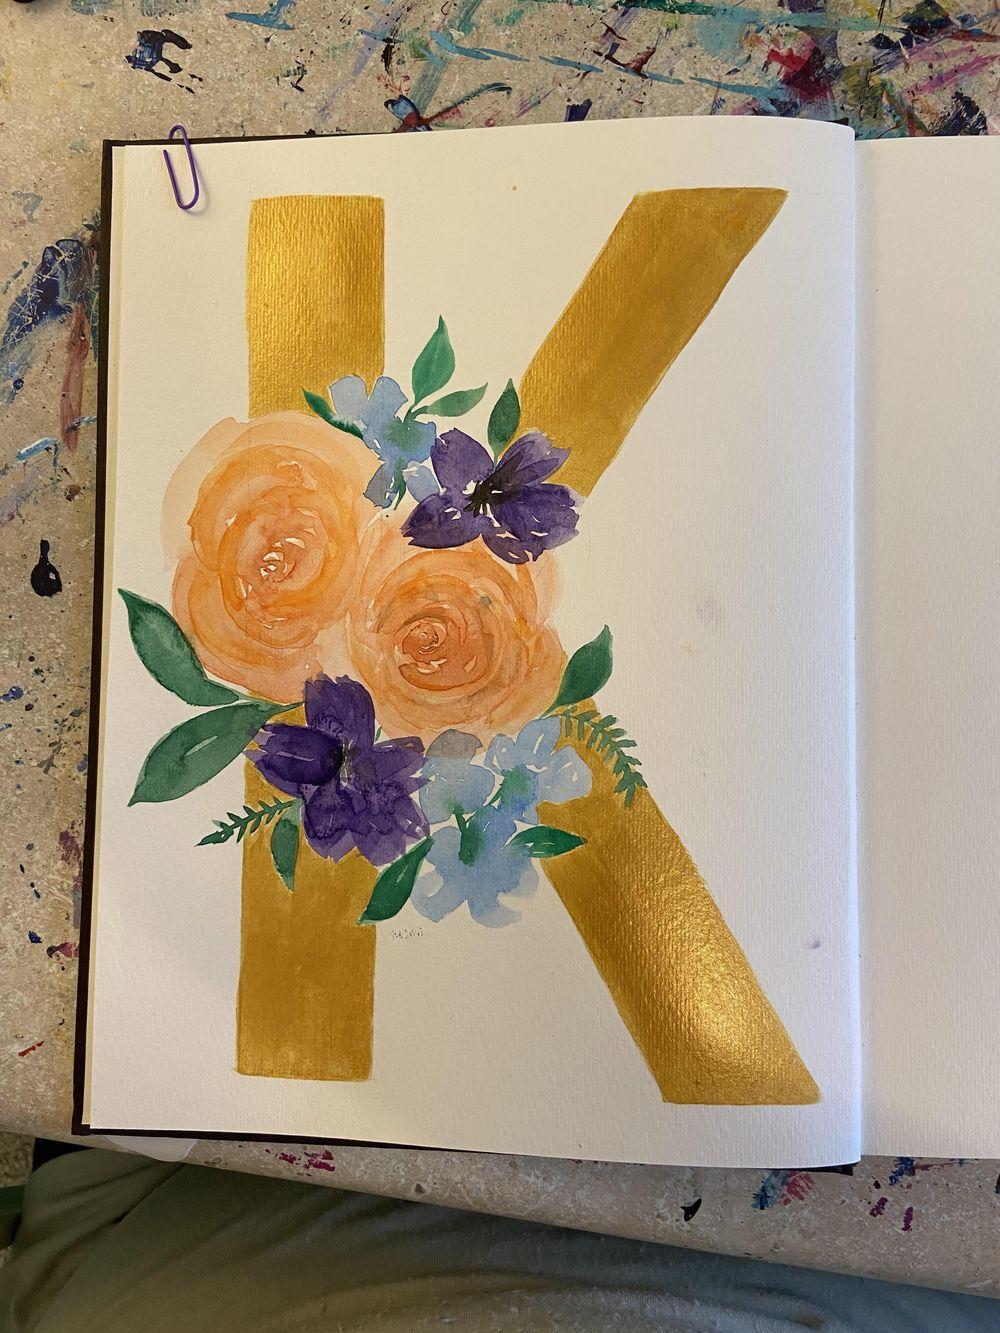 metallic 'K' - image 1 - student project